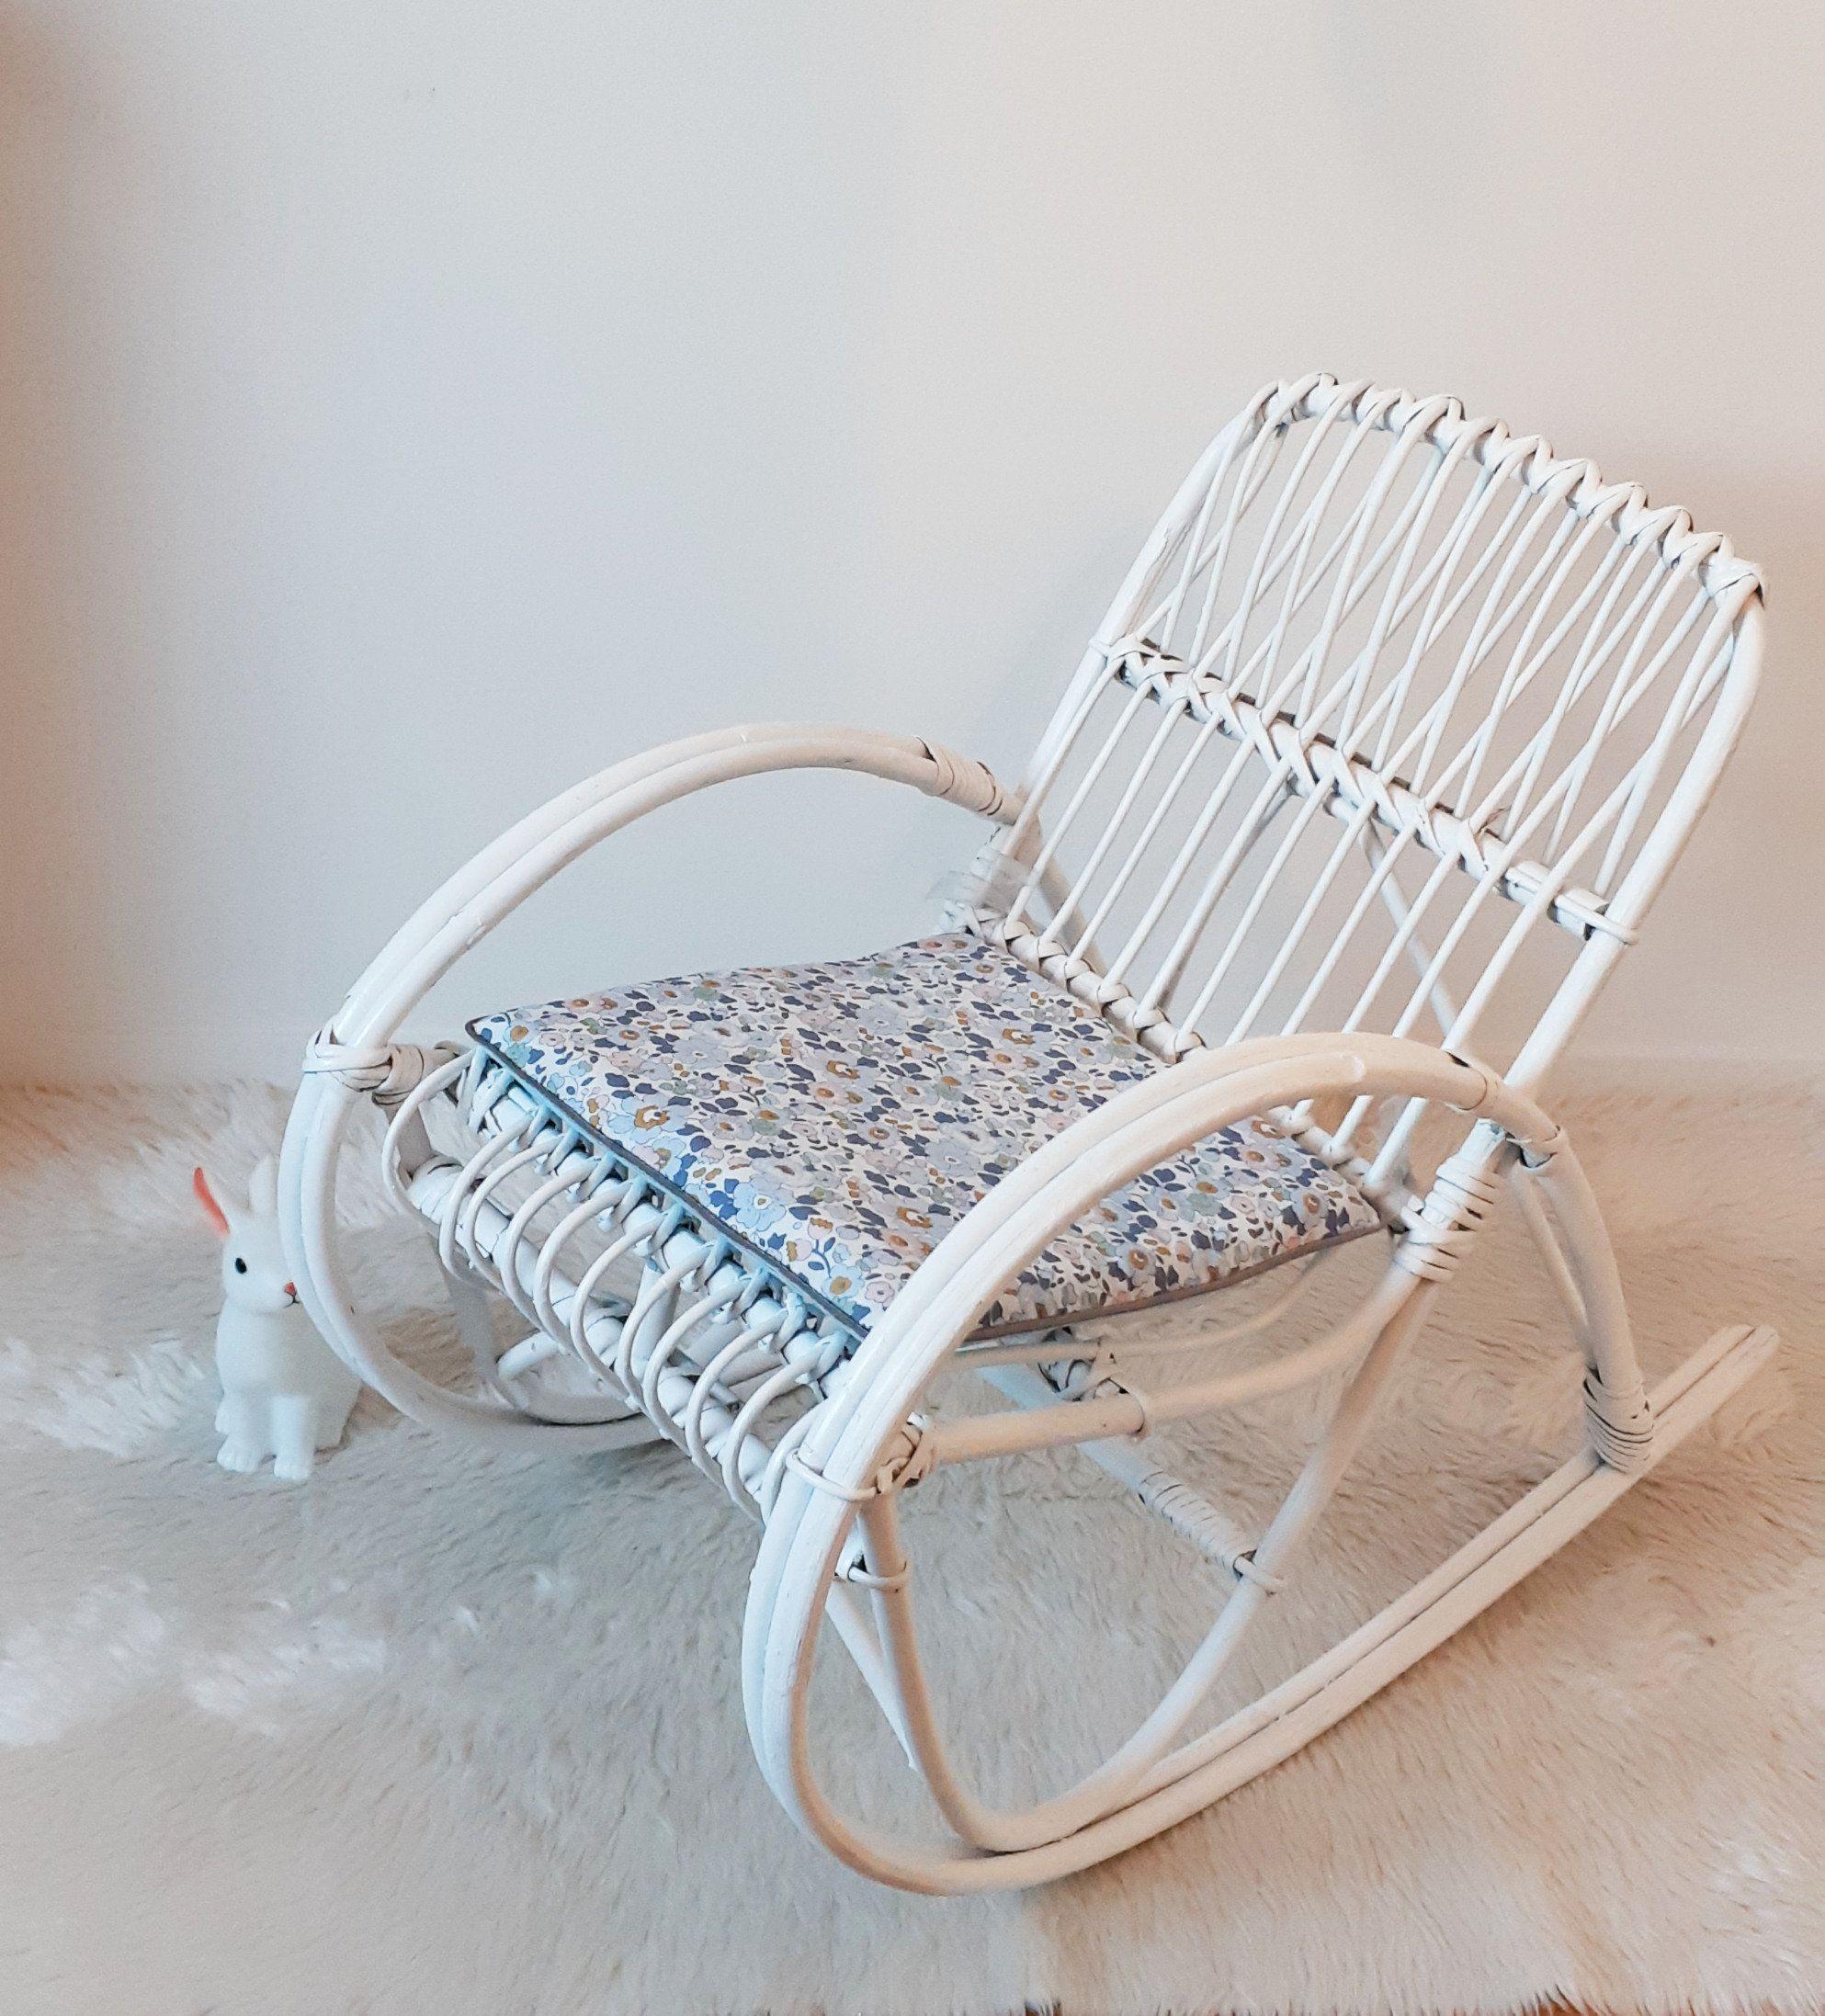 Fauteuil A Bascule Blanc Vintage En Rotin Enfant Osier In 2020 Outdoor Furniture Outdoor Chairs Outdoor Decor